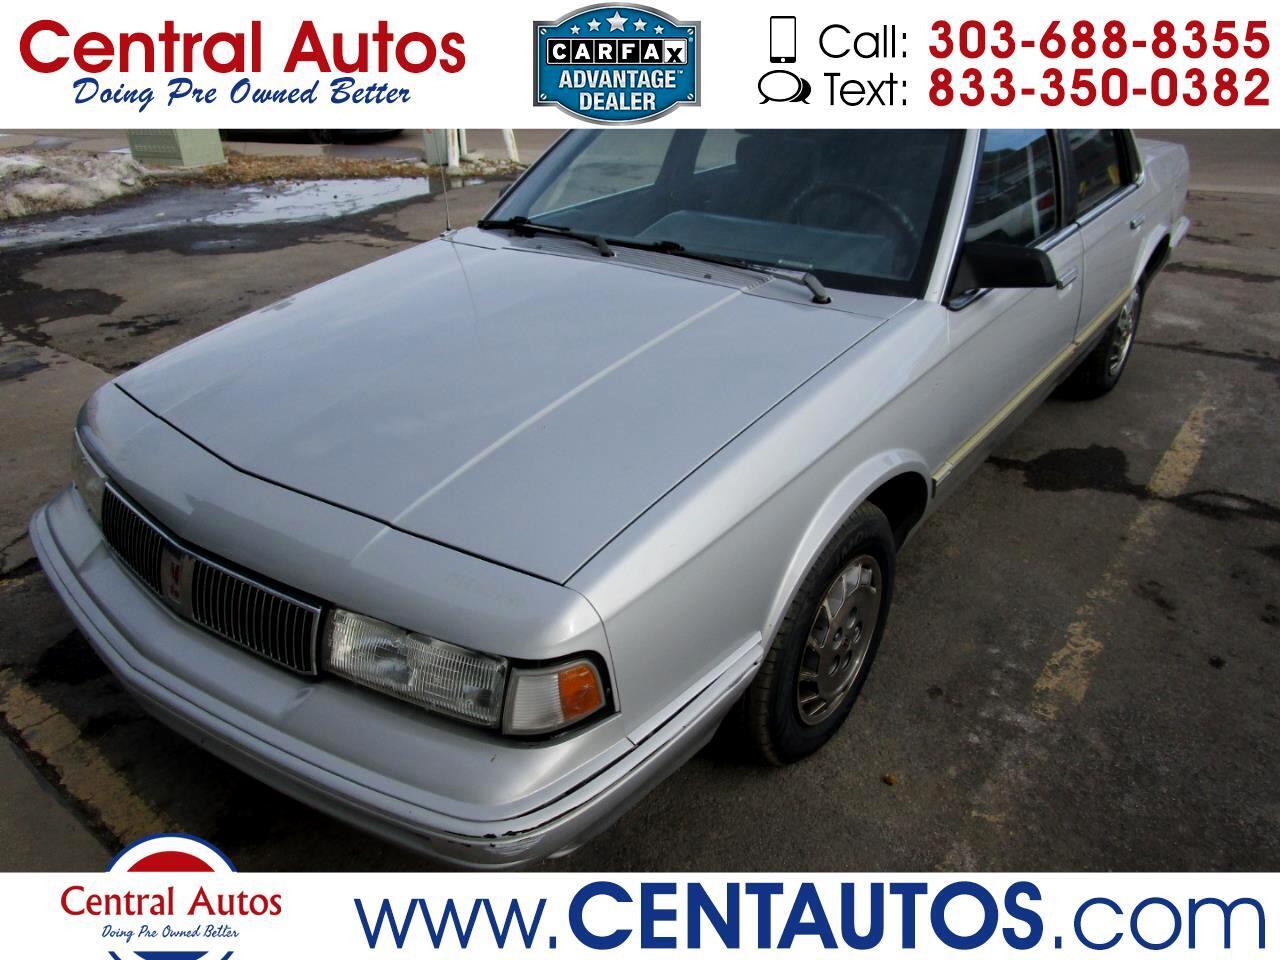 Oldsmobile Cutlass Ciera/Cruiser 4dr Sedan Special Edition R7C 1994